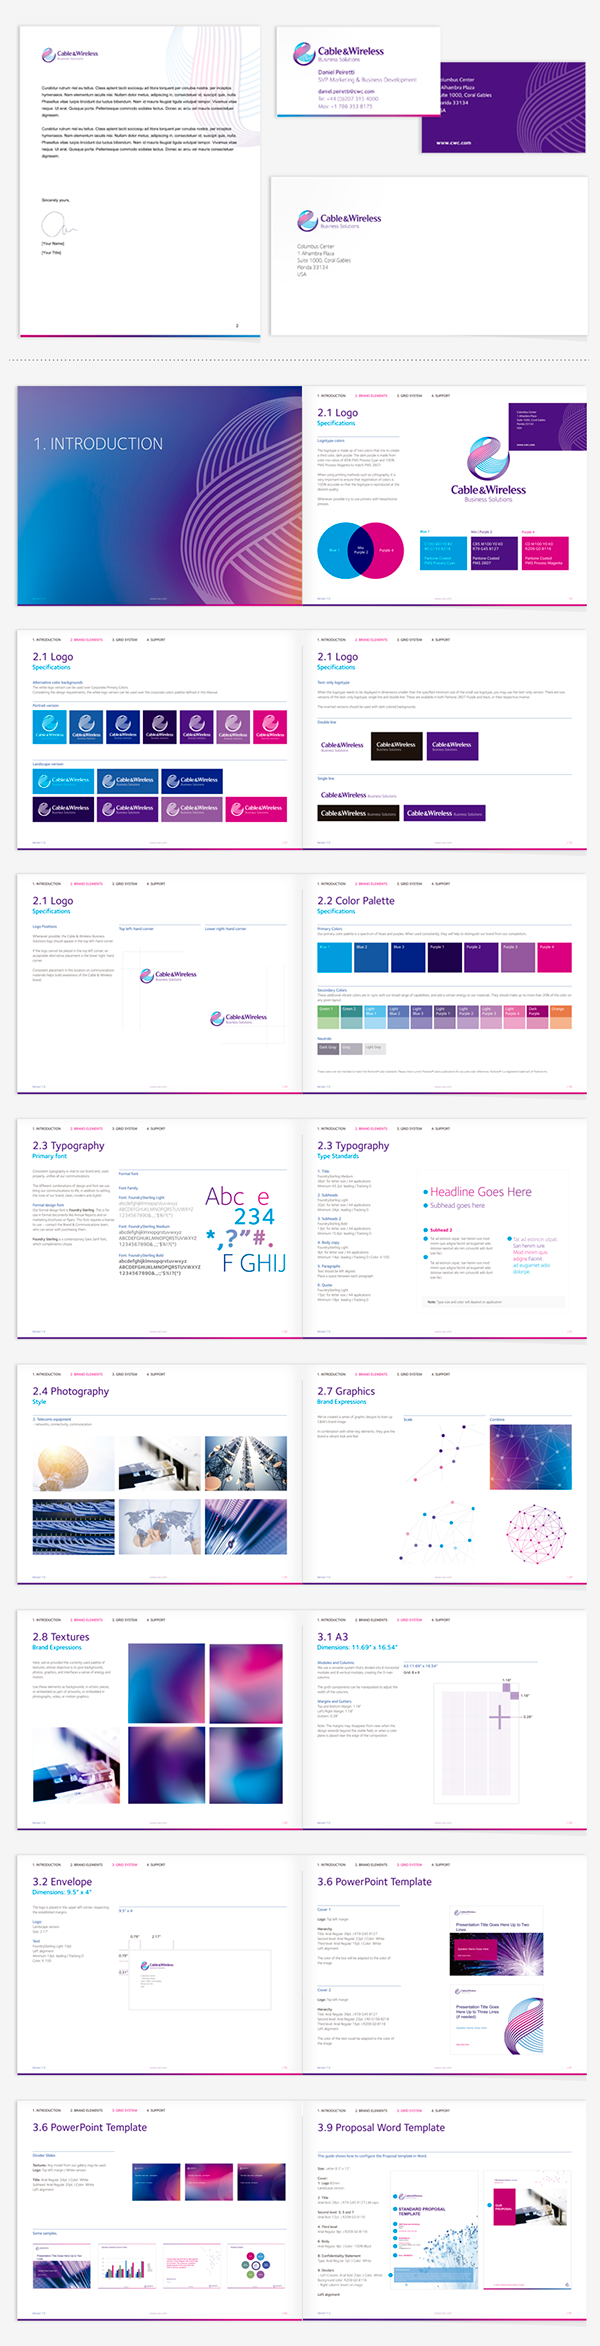 100 Brand Guide Ideas Brand Guide Brand Guidelines Brand Book